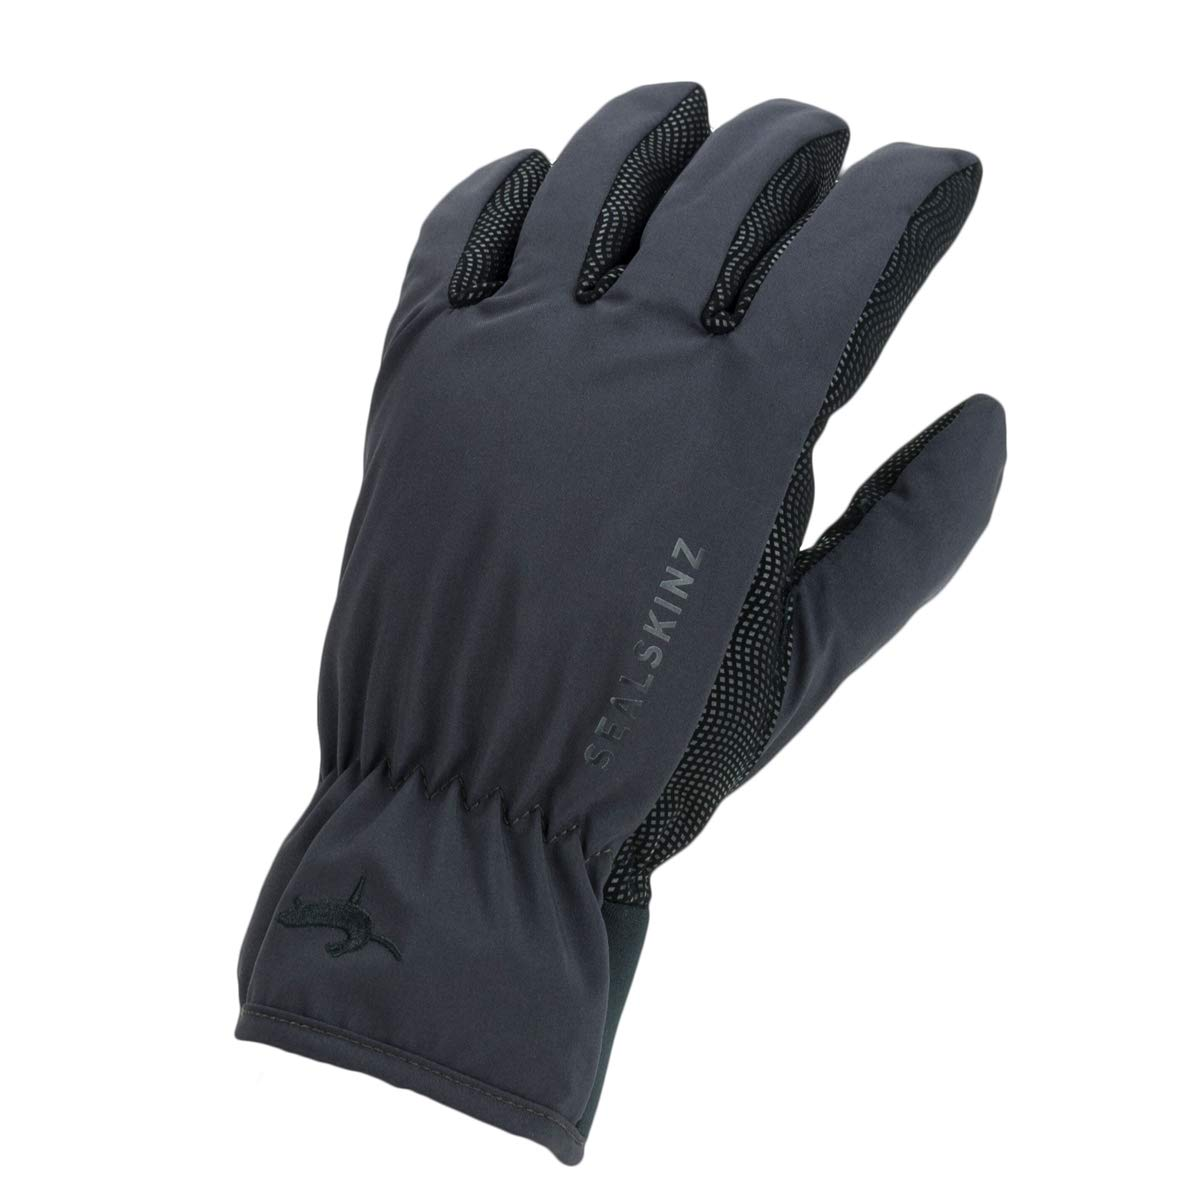 SealSkinz Waterproof All Weather Lightweight Glove Mixte